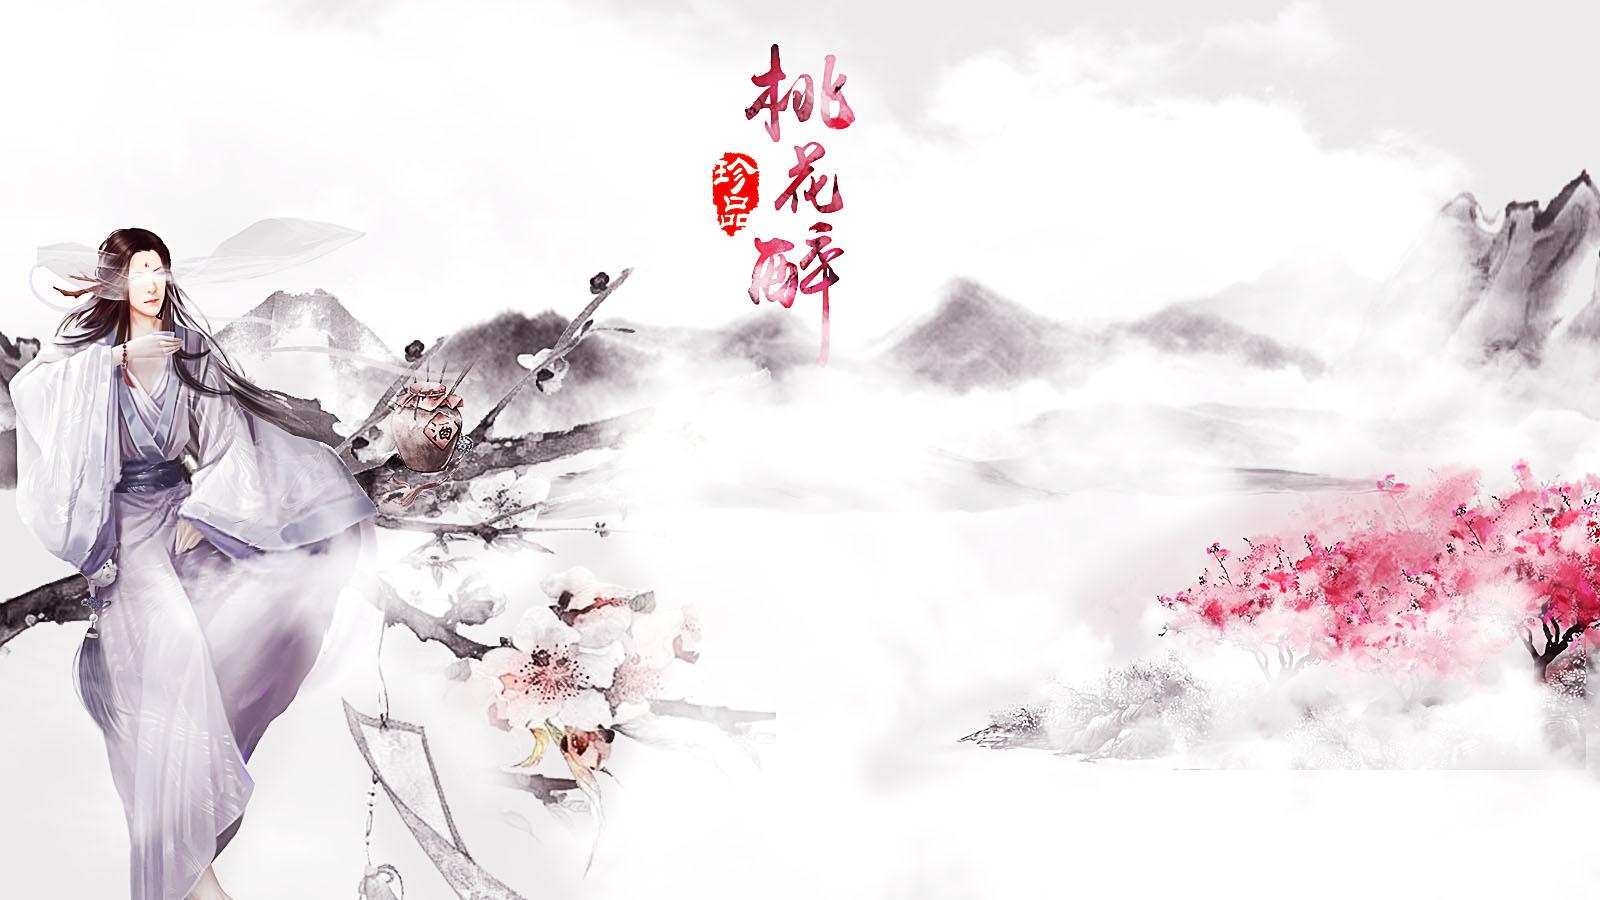 ps练习 -中国风人物海报